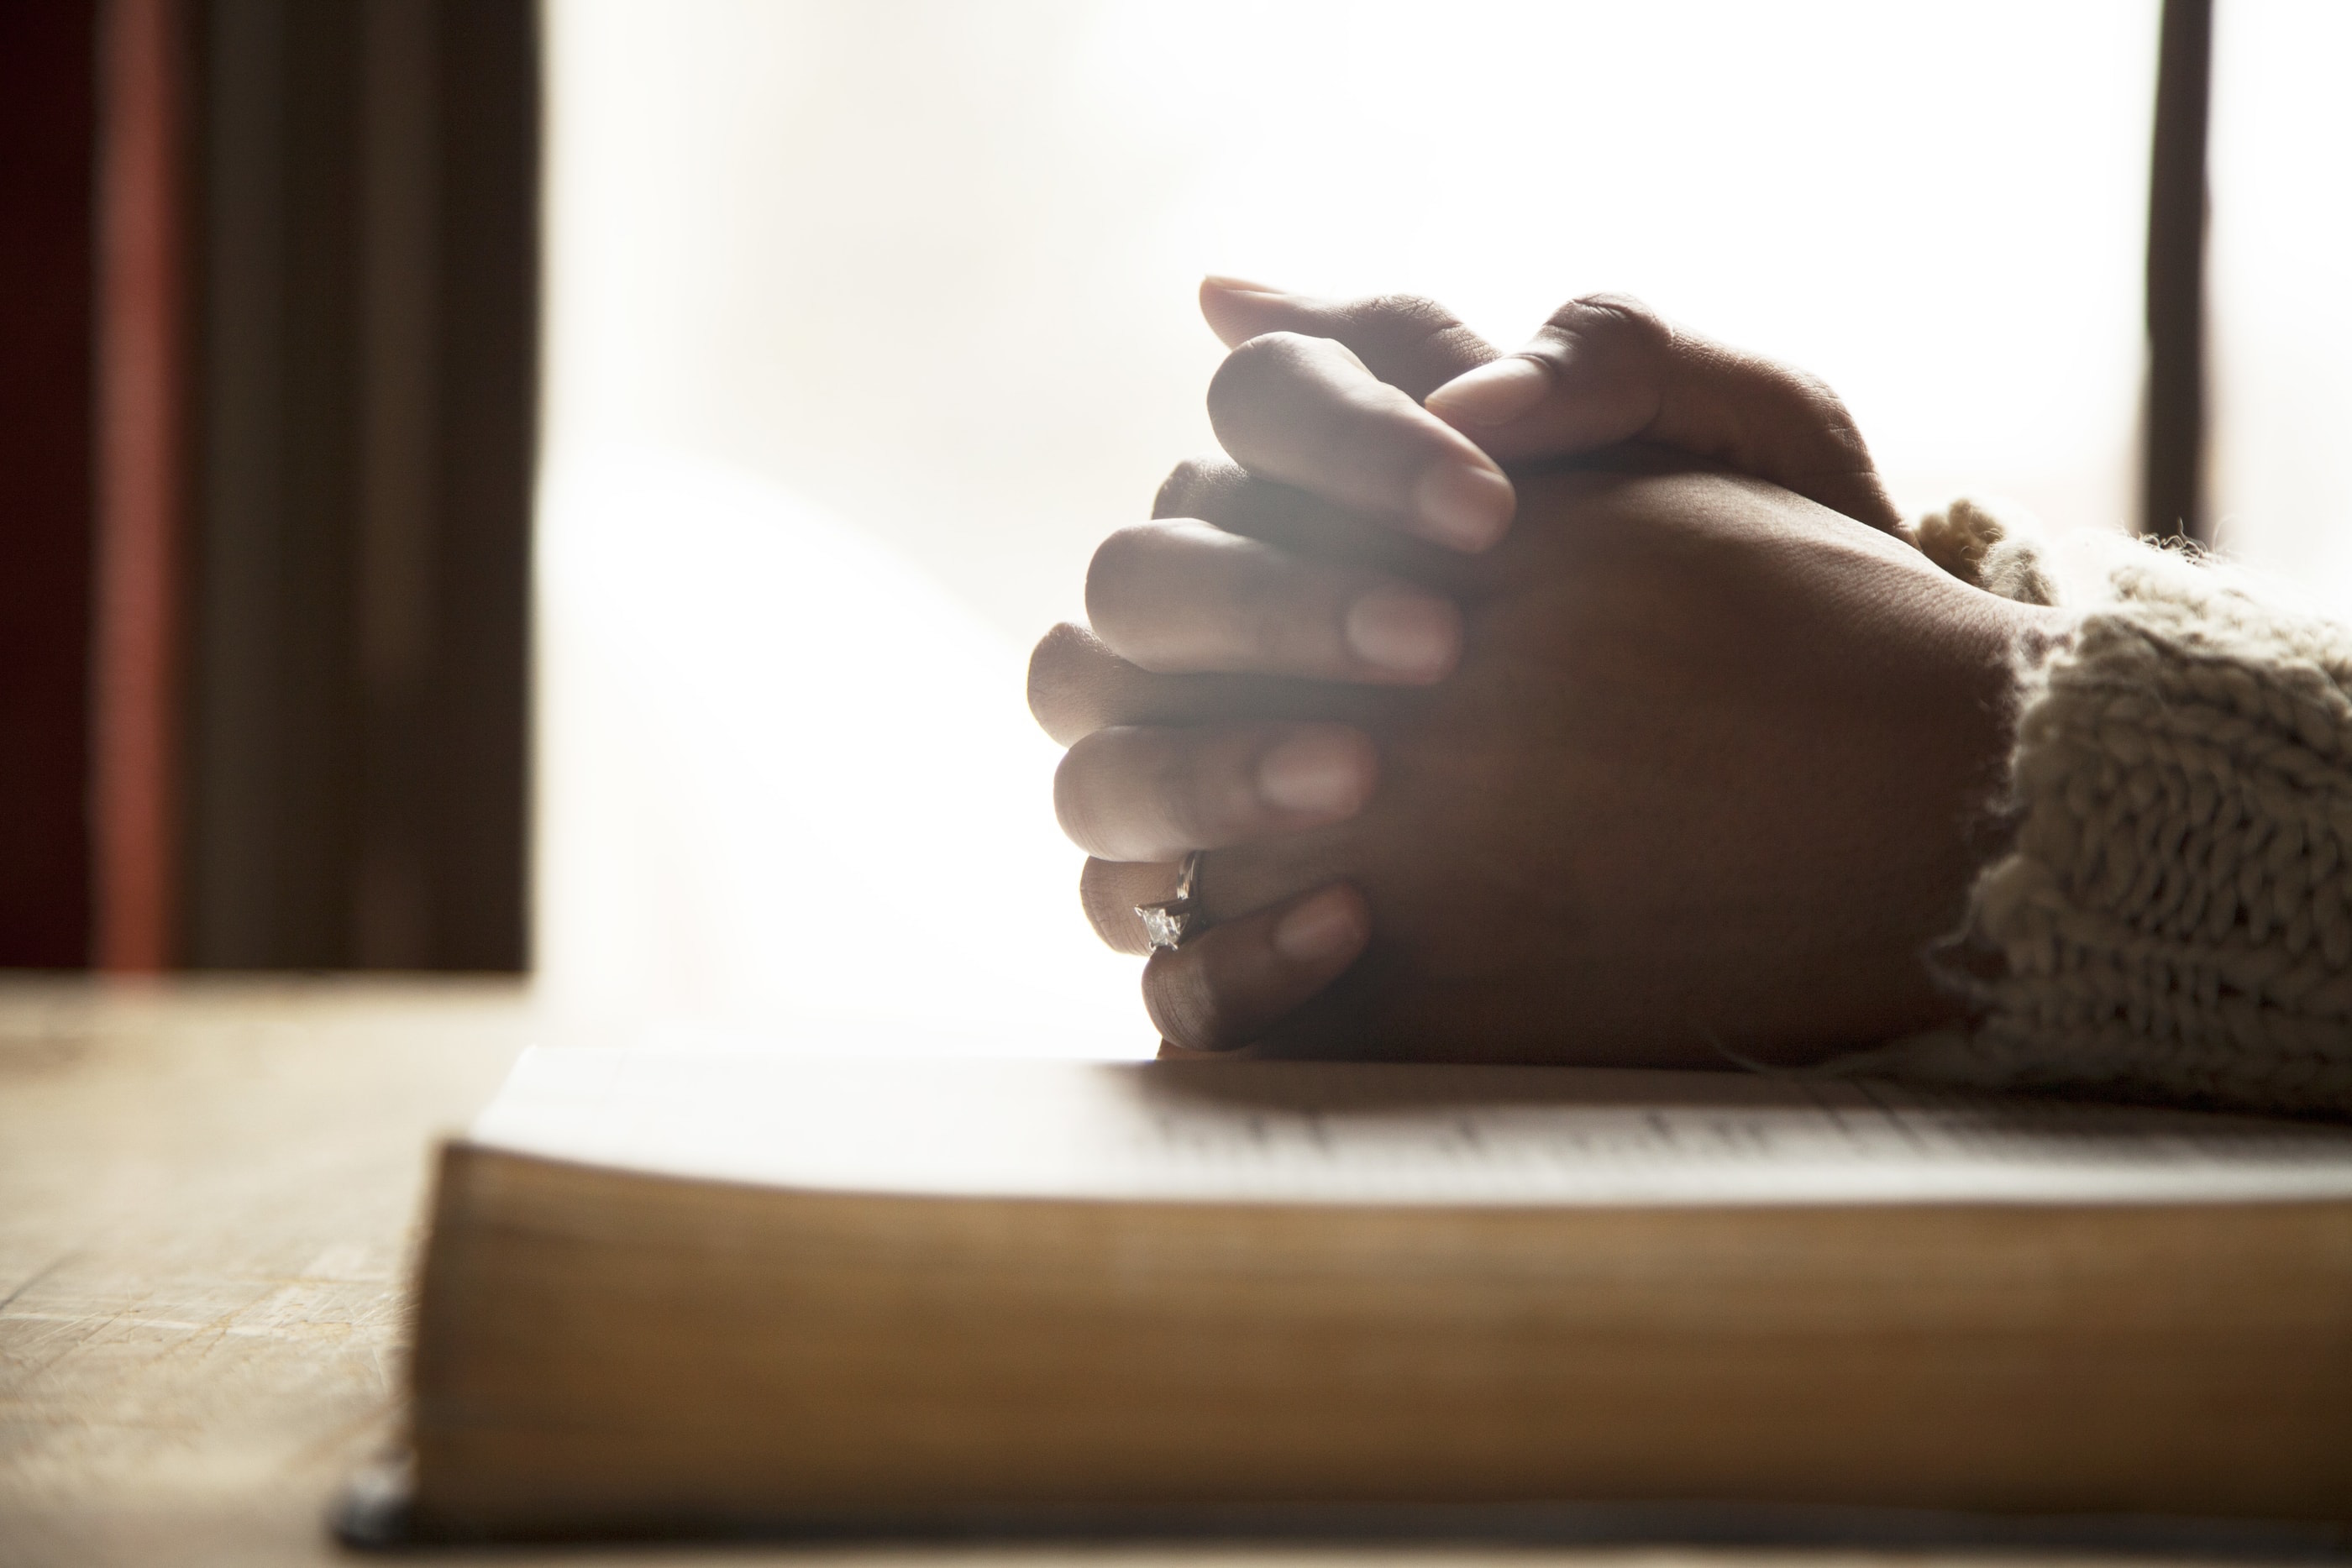 Should women be seminary professors? (Image credit: Lightstock.com)